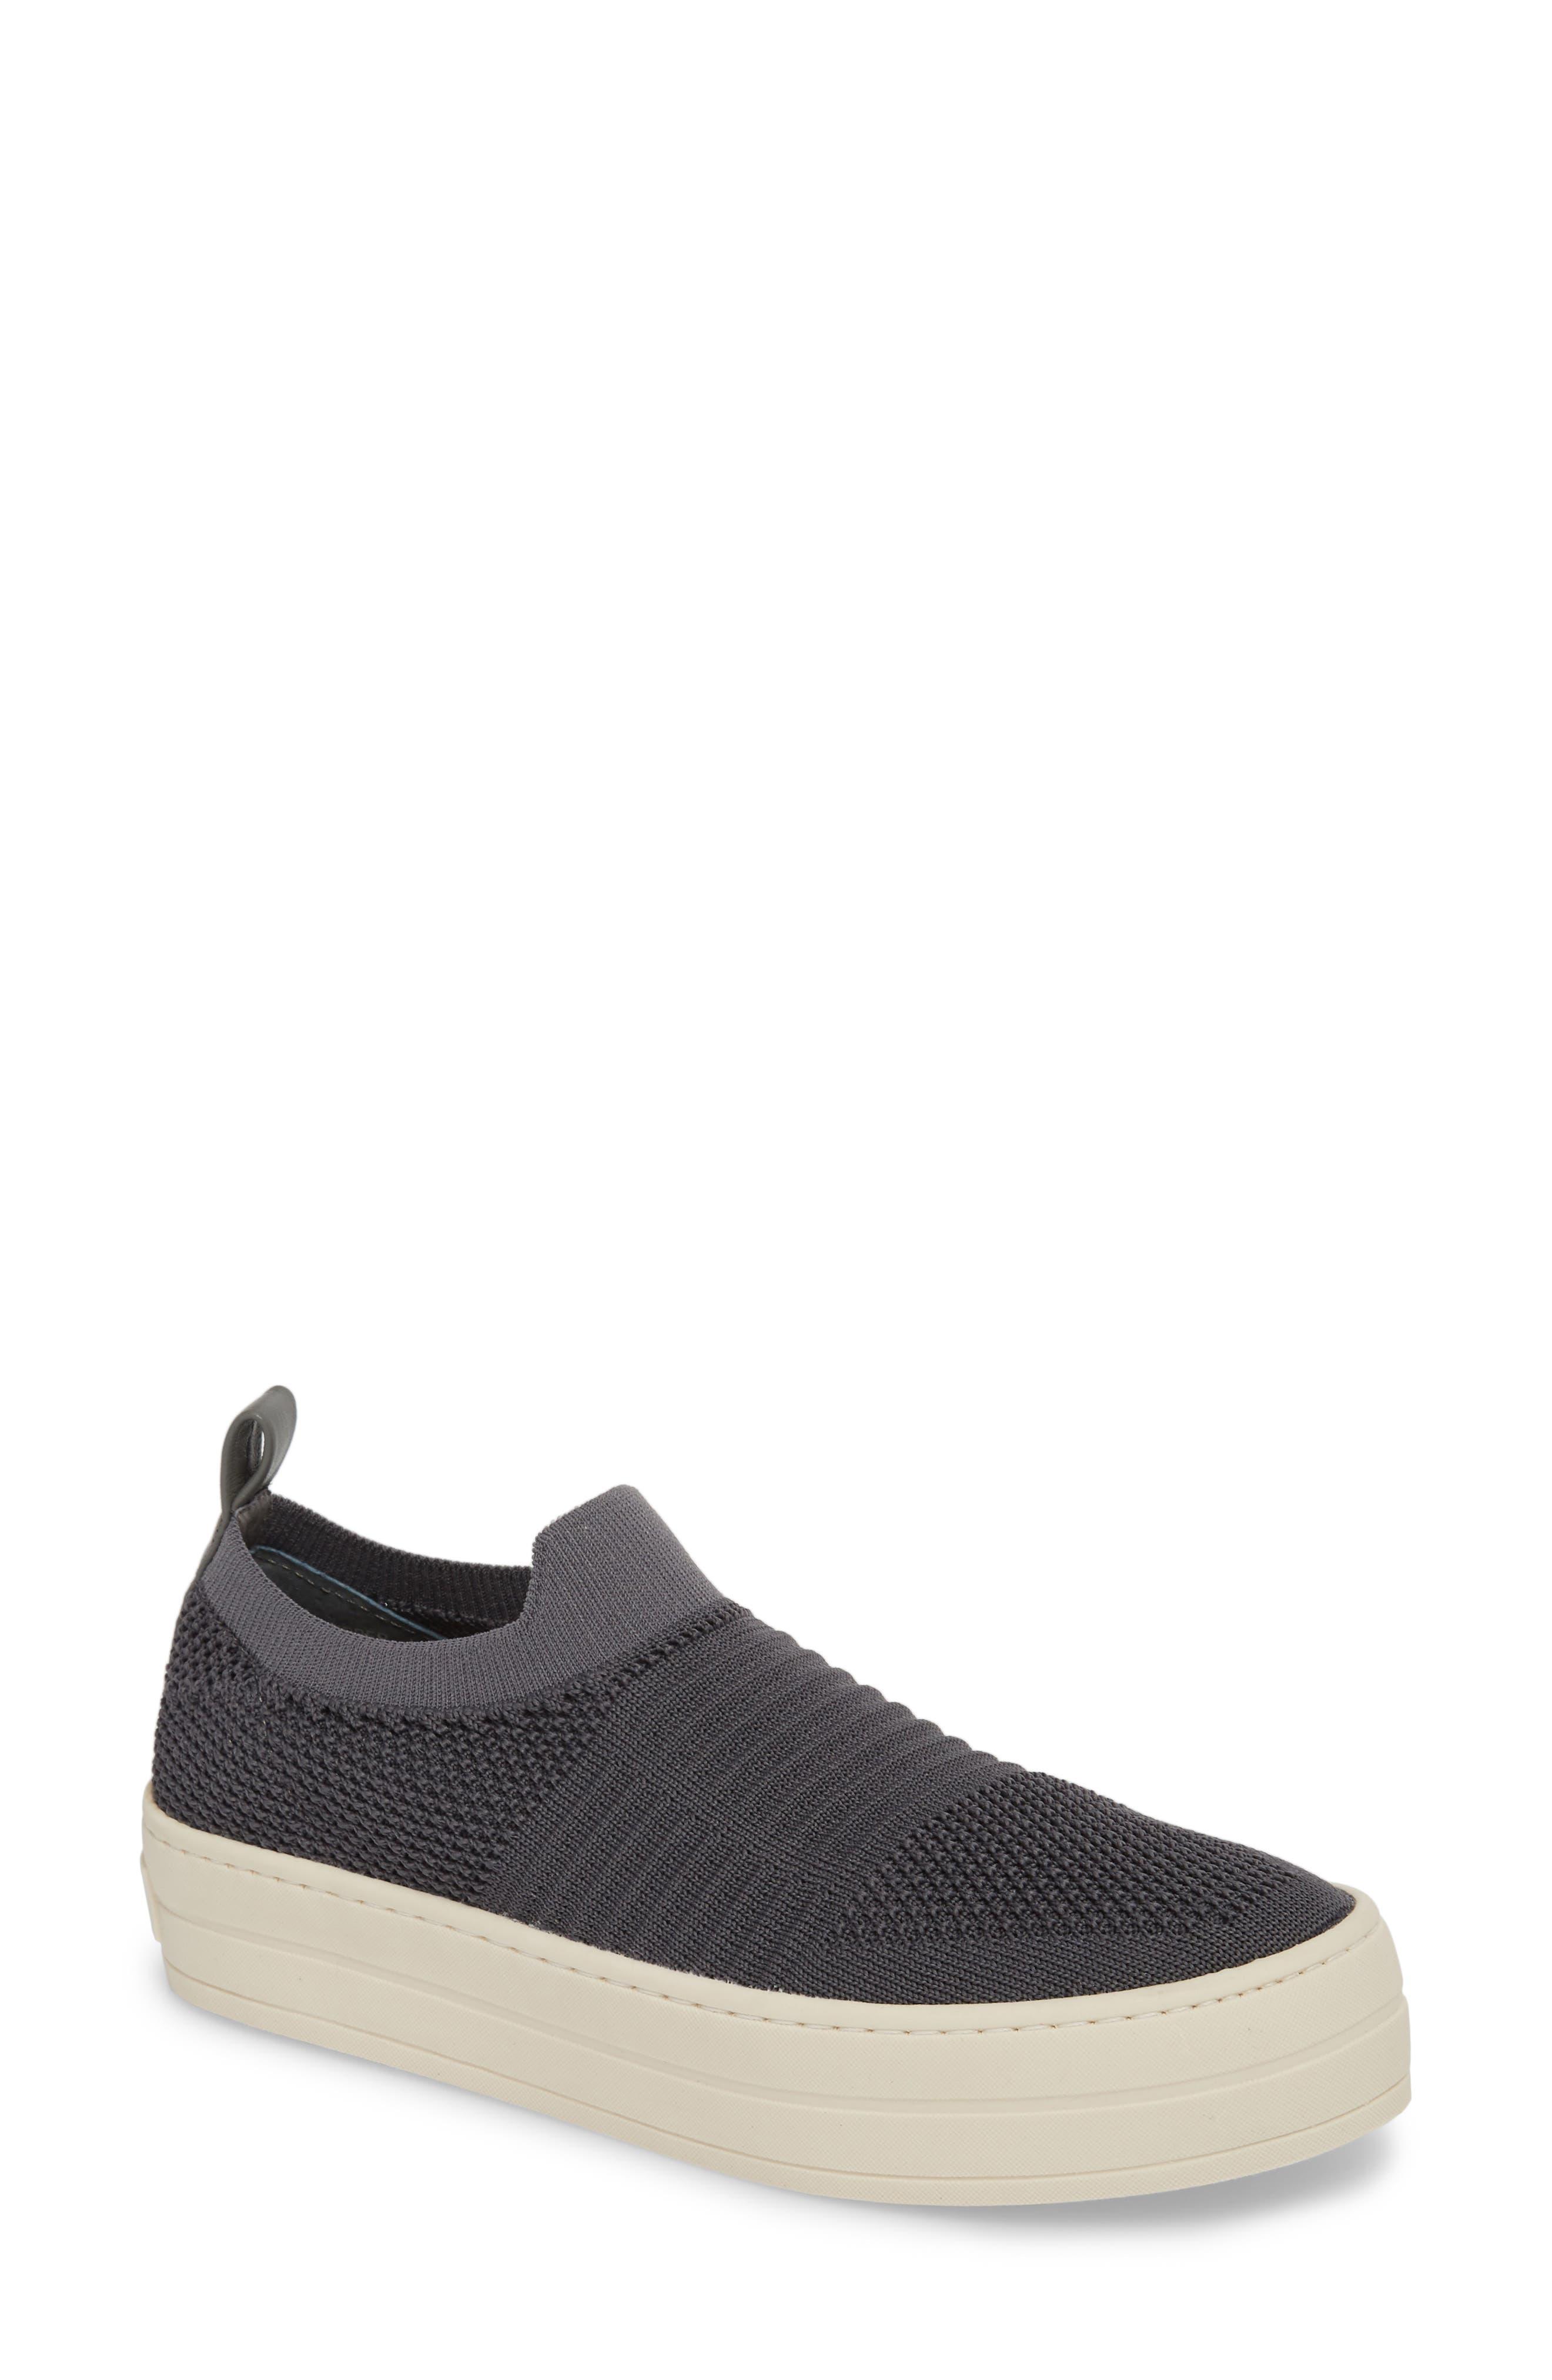 JSlides Hilo Platform Slip-On Sneaker (Women)